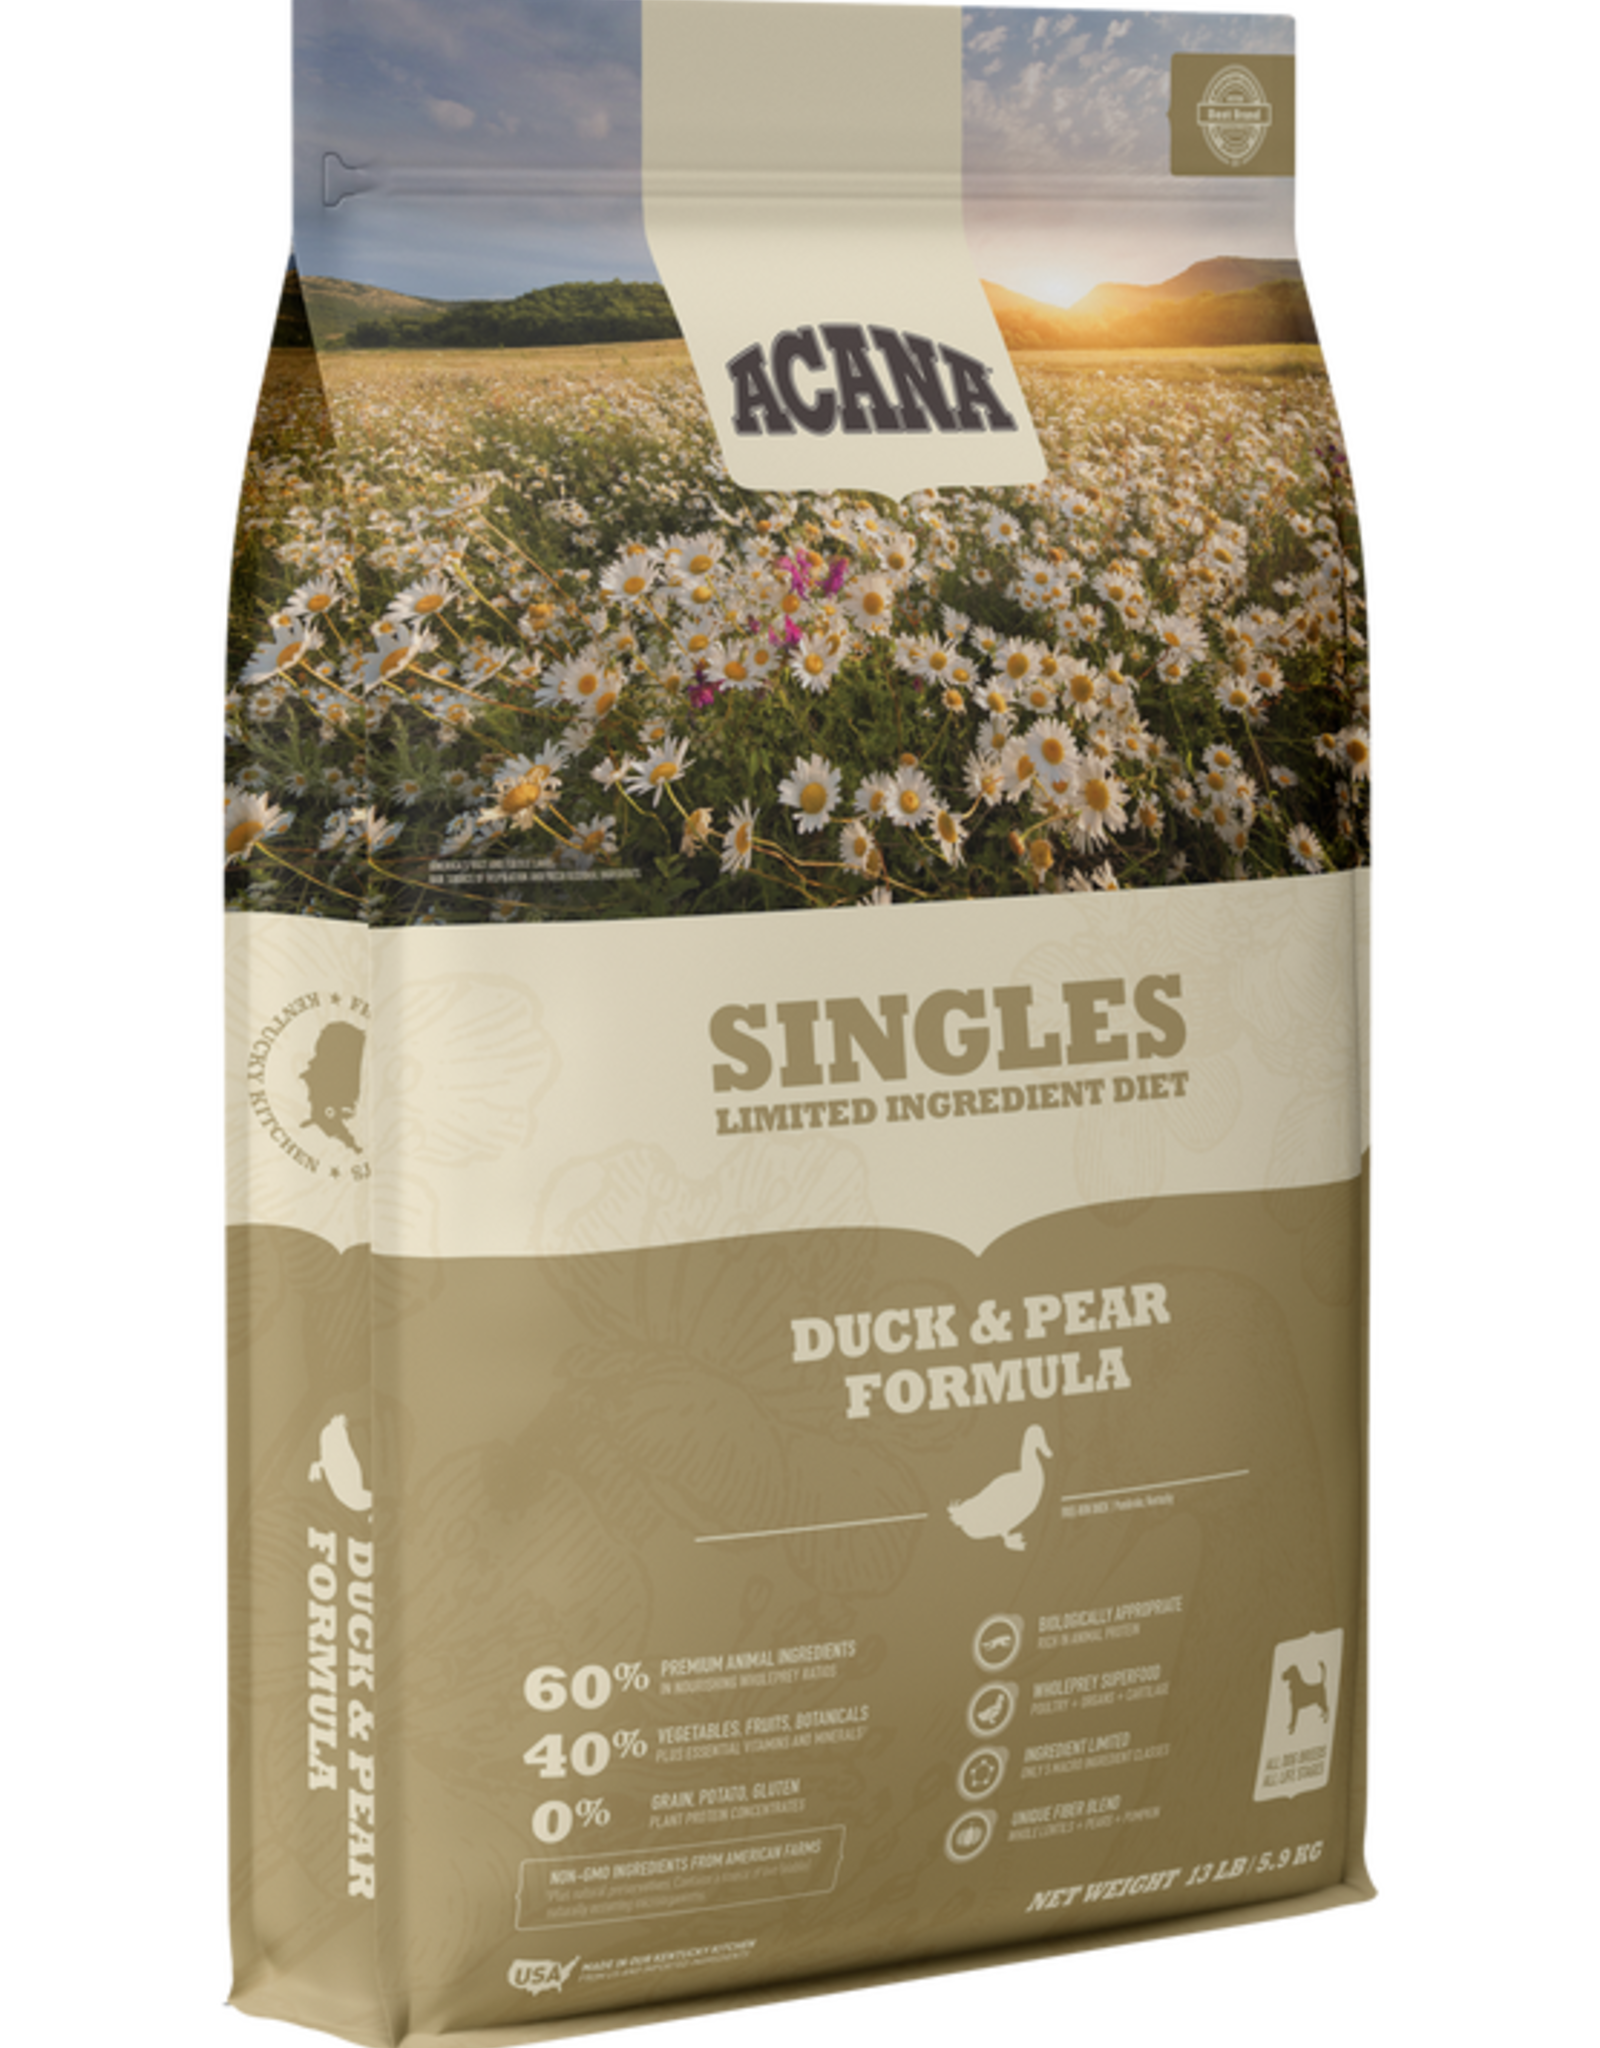 CHAMPION PET FOOD ACANA DUCK & PEAR SINGLES 4.5LBS